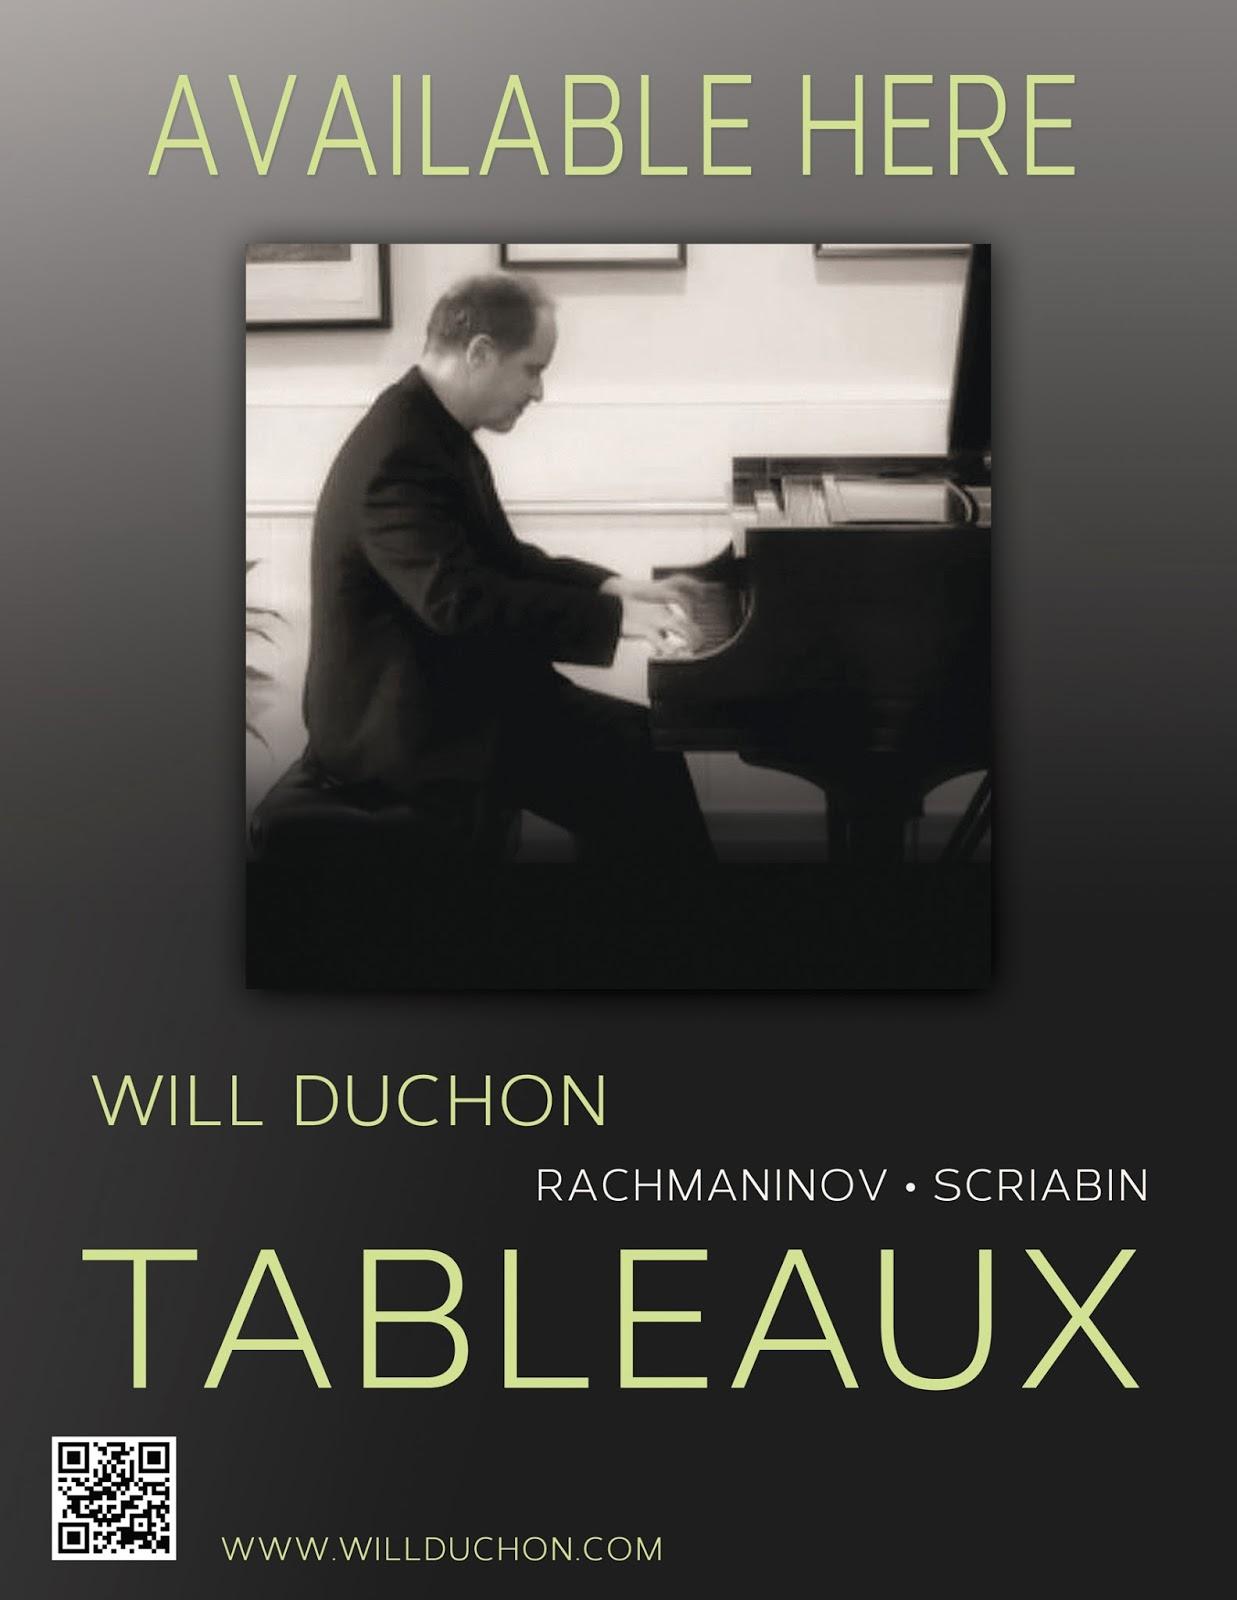 Will Duchon - Tableaux